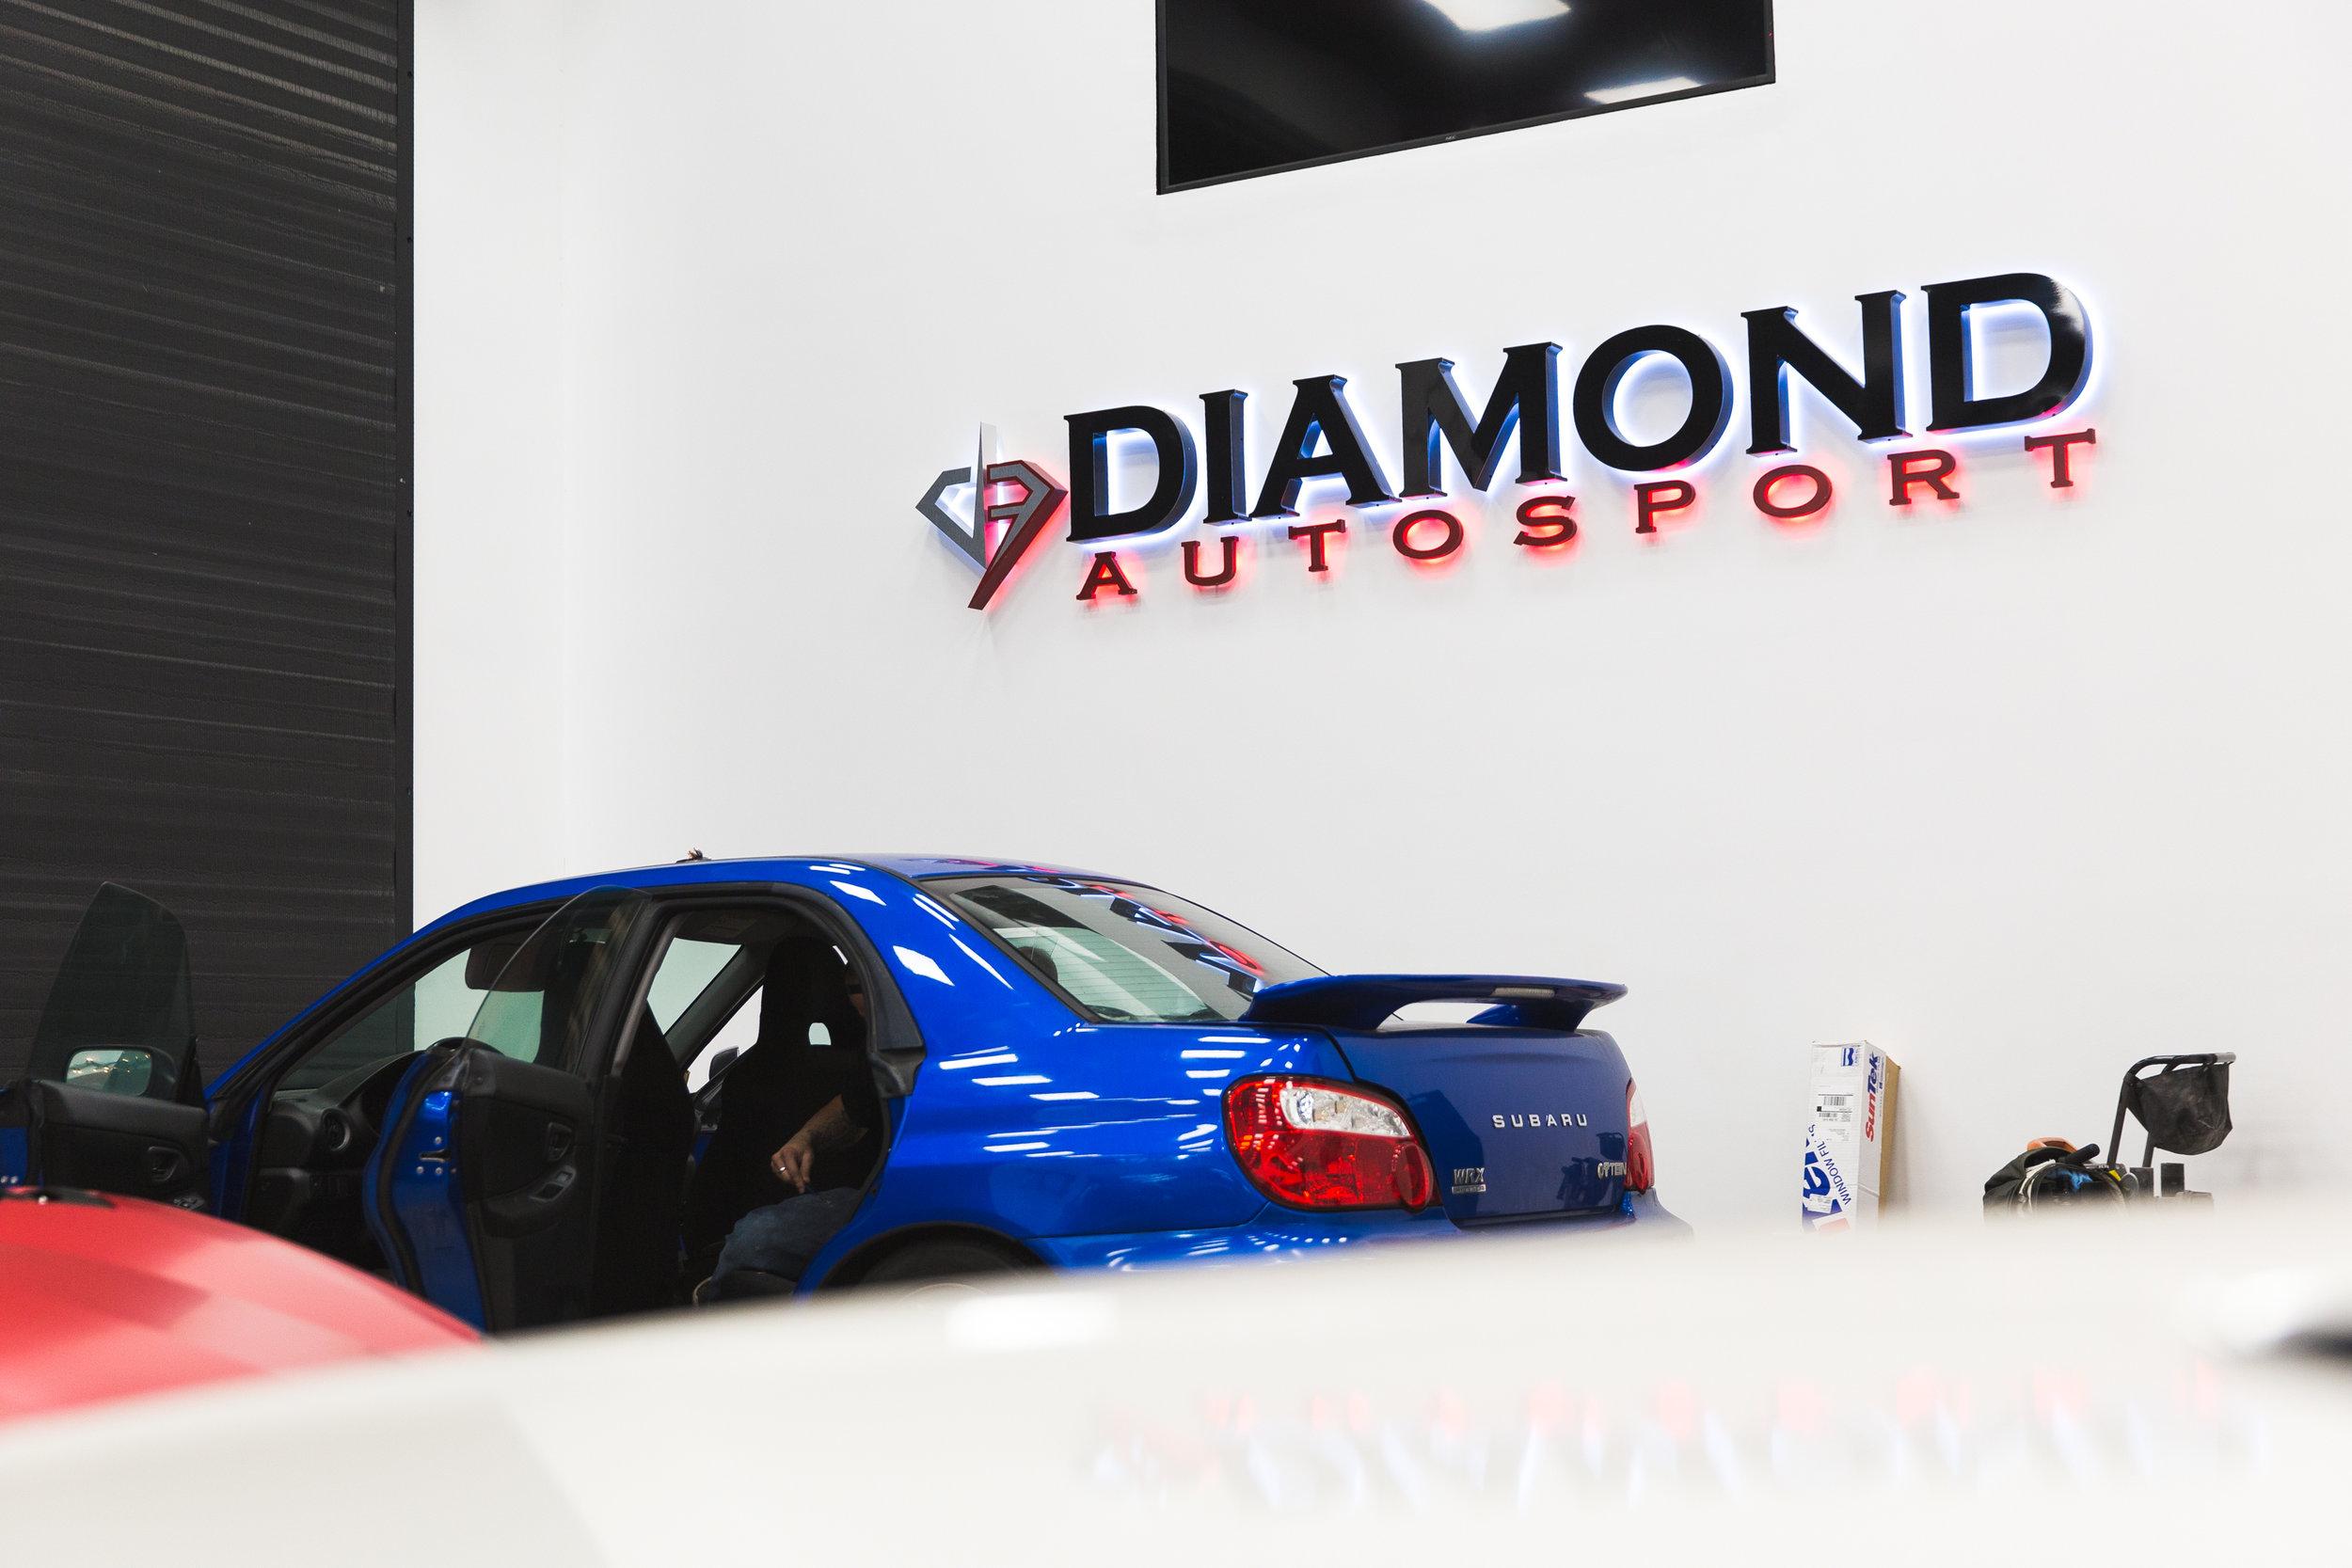 Stay_Driven_Sacramento_Diamond_Autosport-13.jpg